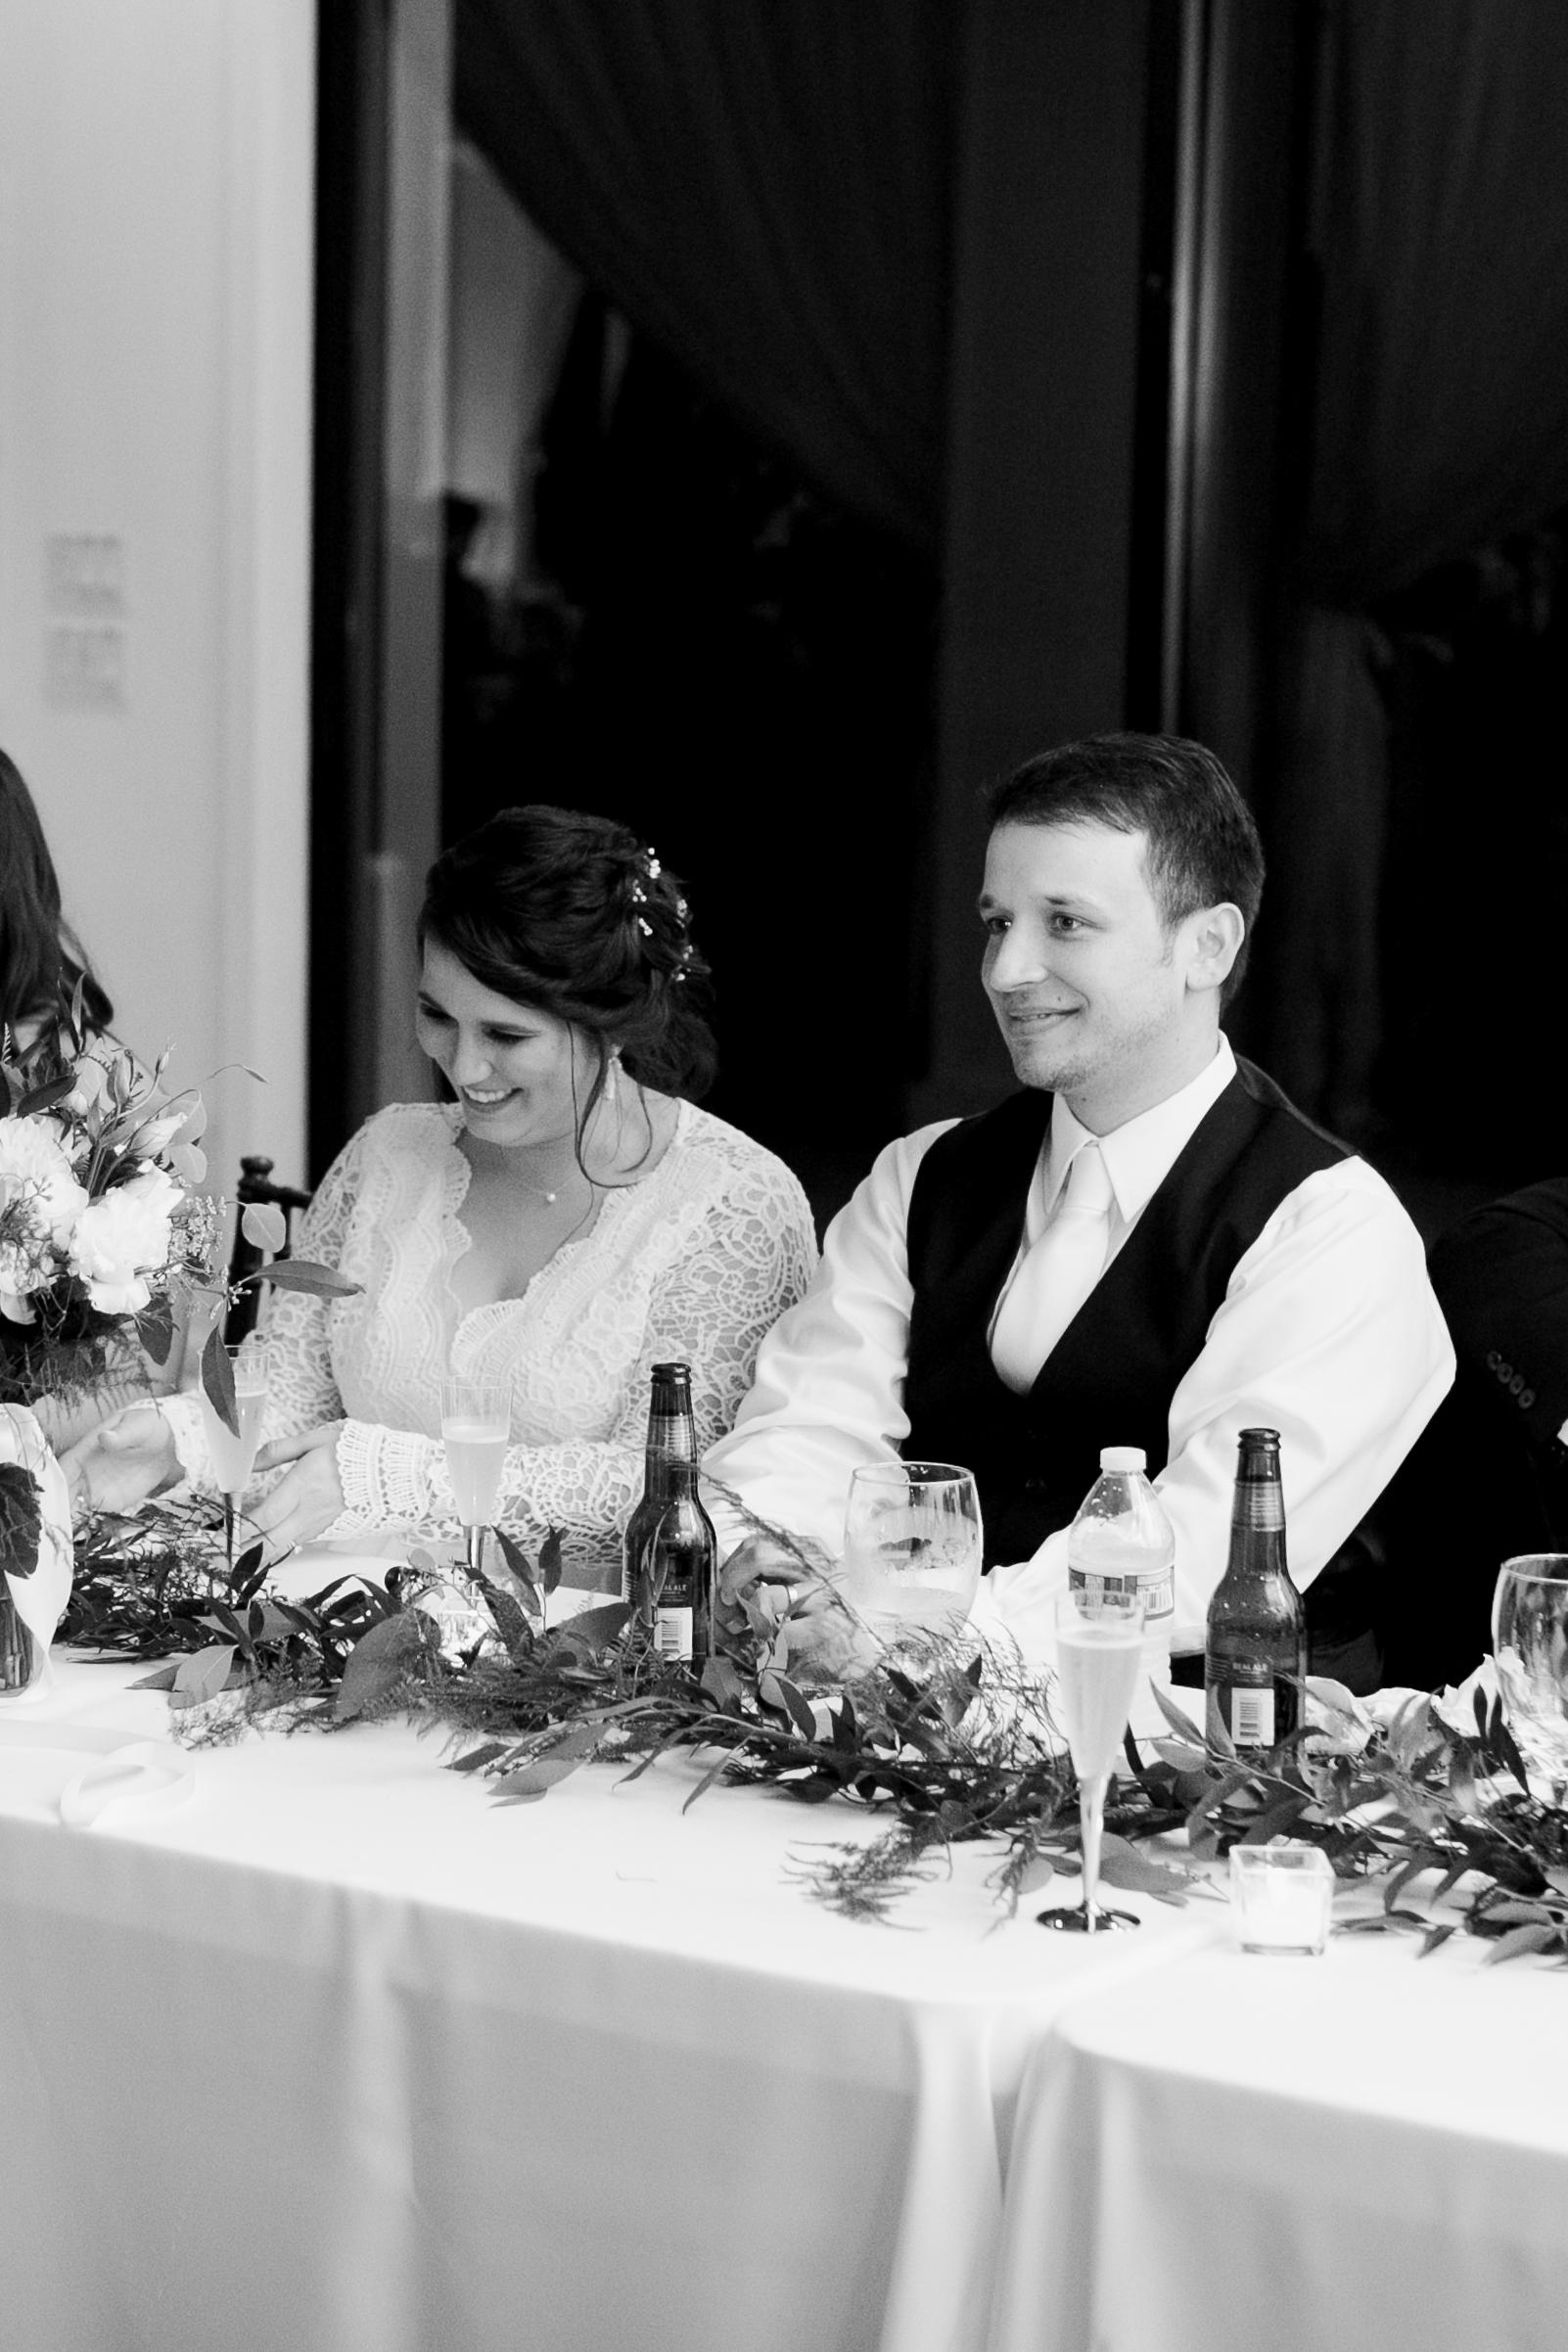 Austin_Texas_Fine_Art_Wedding_Photographer_Kayla_Snell_Photography_Antebellum_Oaks615.jpg